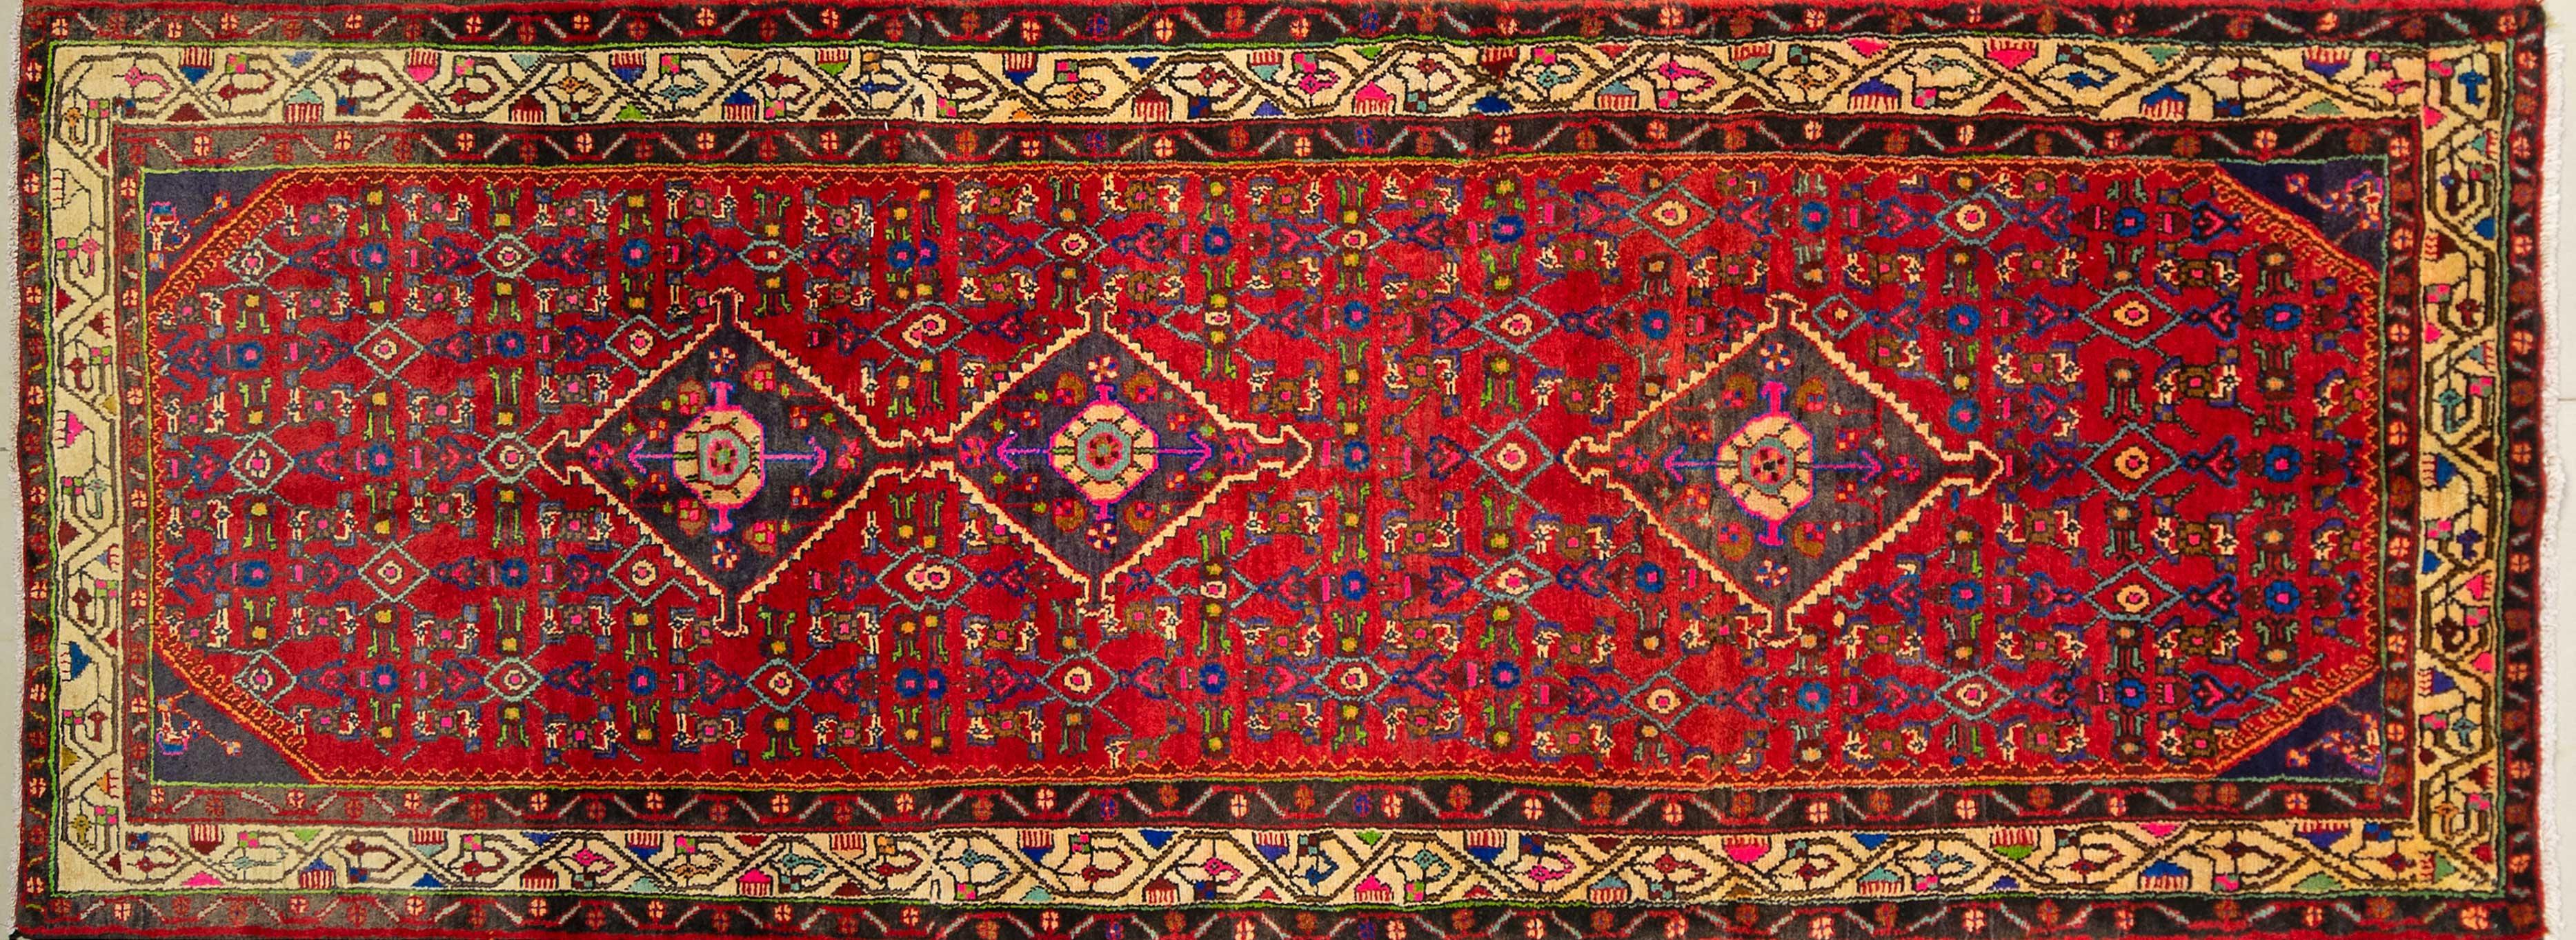 A Persian Hand Knotted Hamadan Carpet, 300 x 115